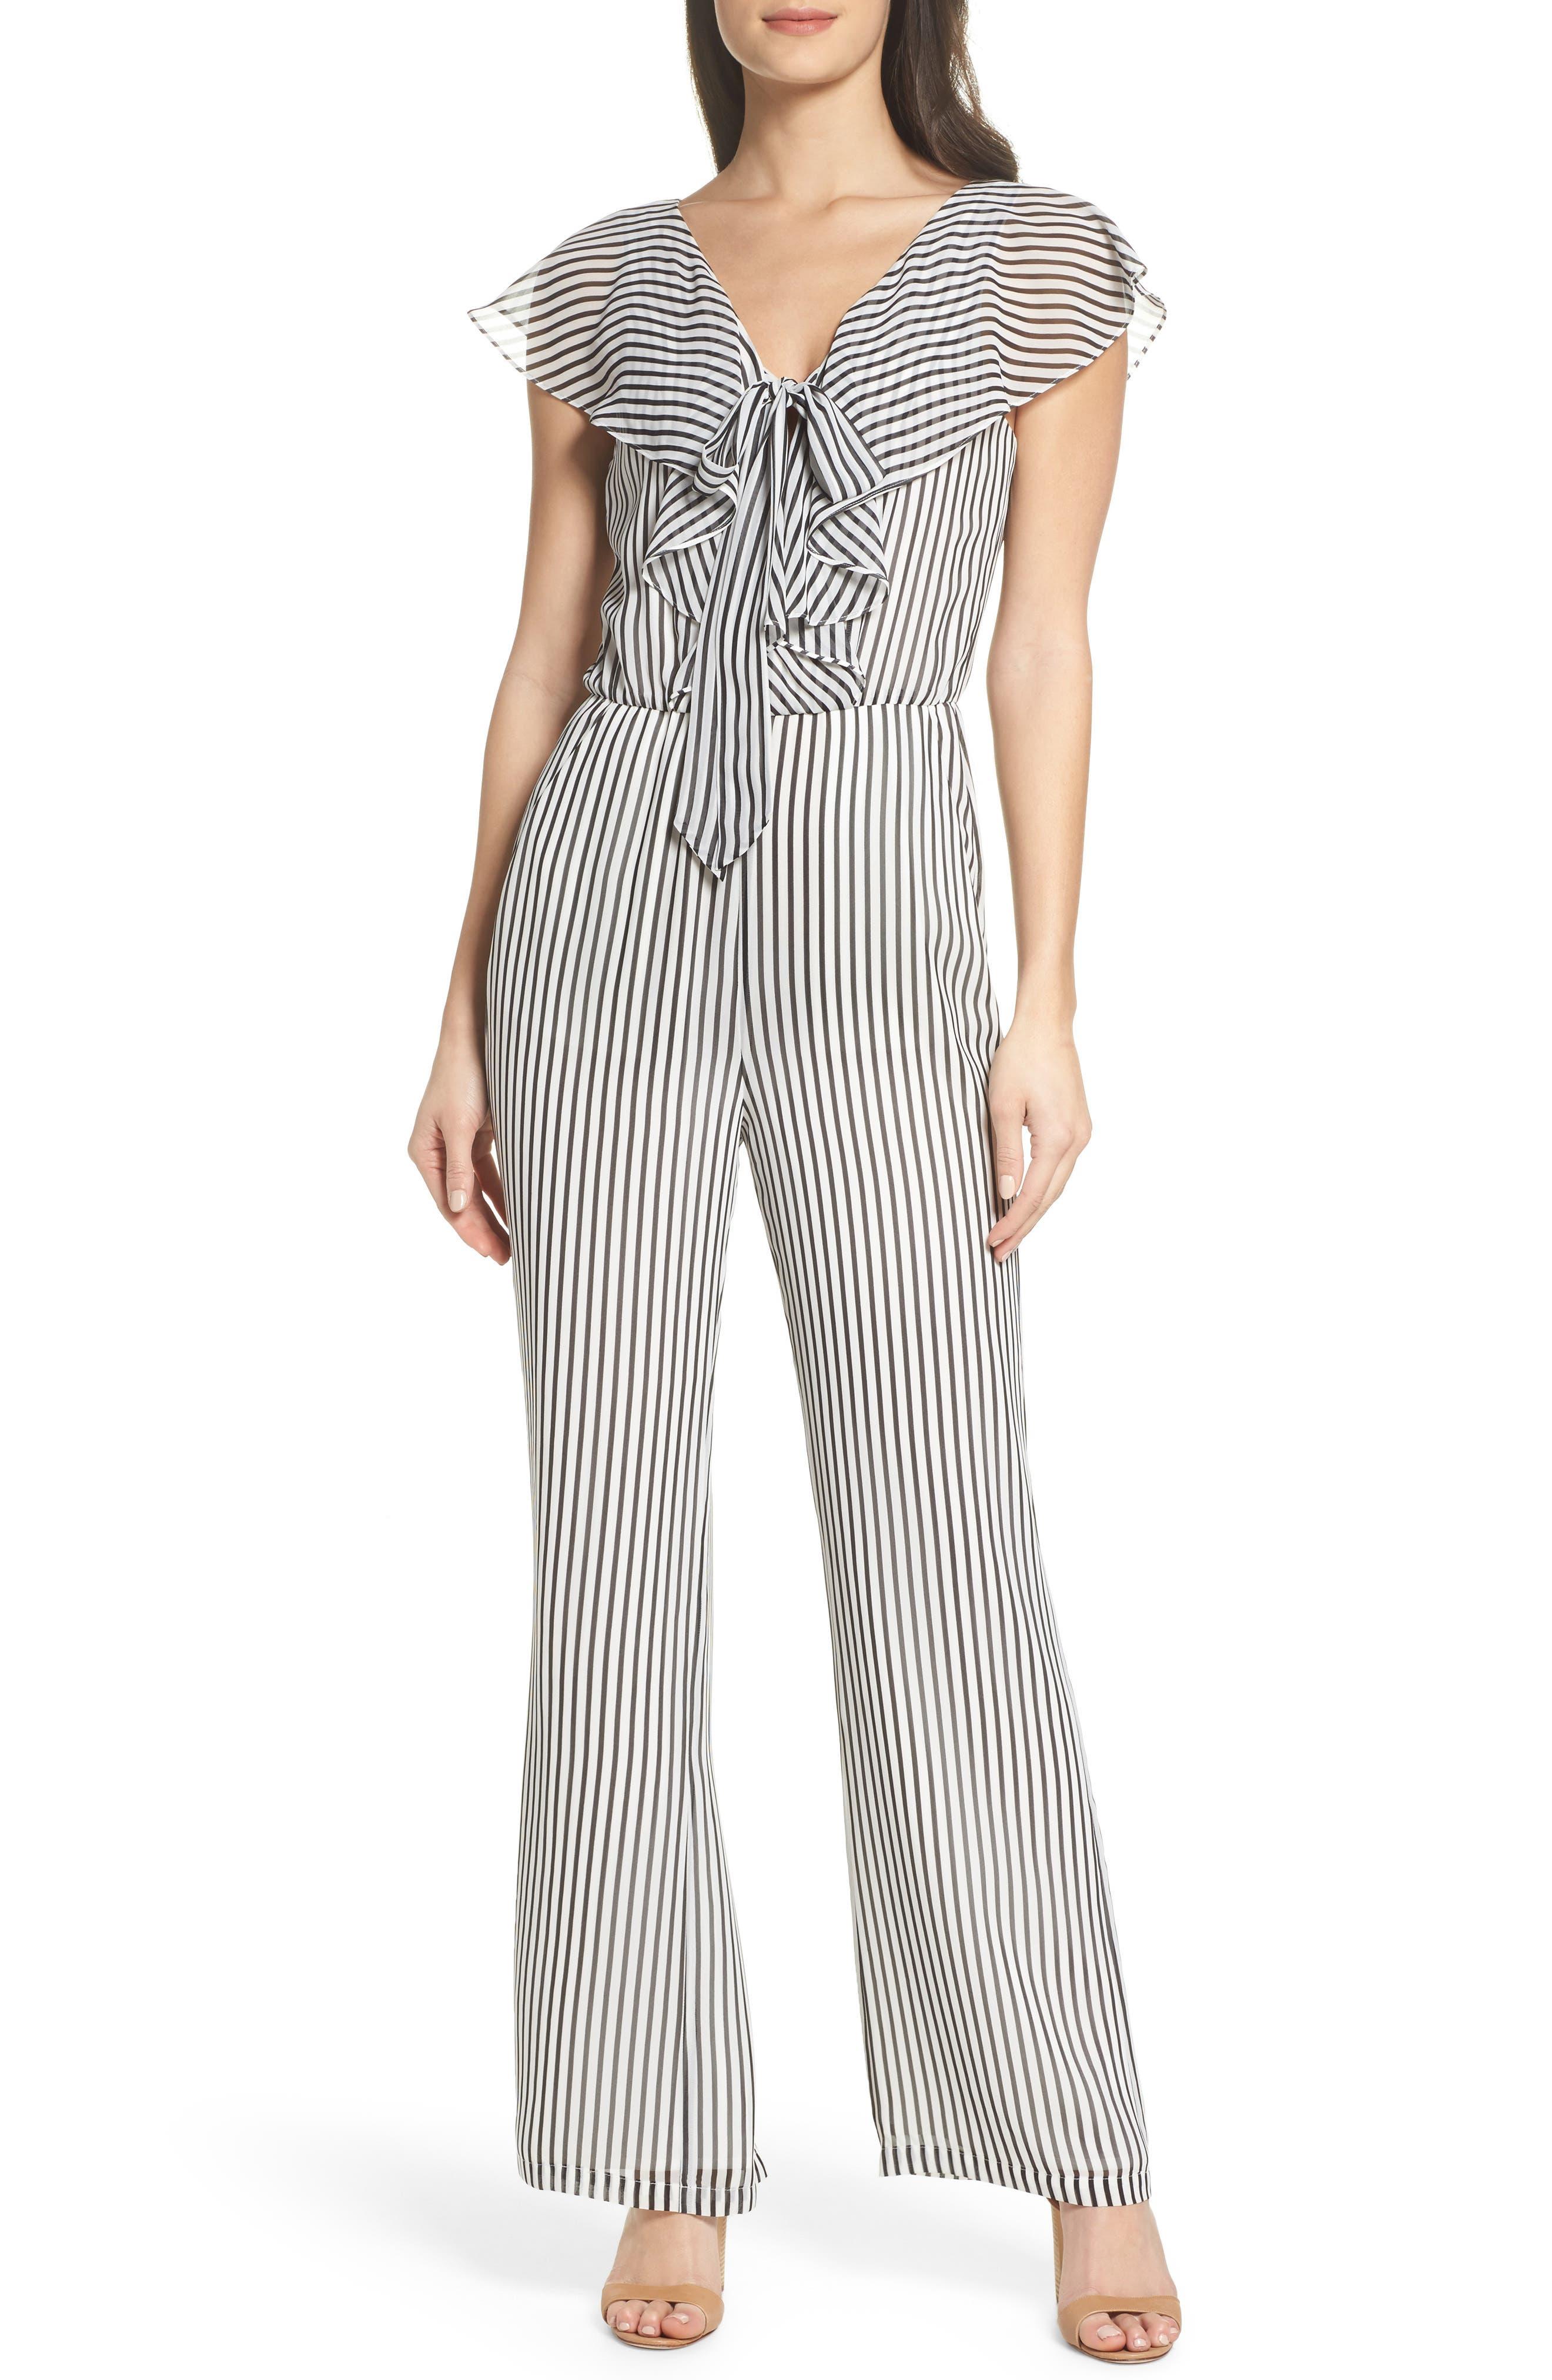 Cherry on Top Stripe Ruffle Jumpsuit,                         Main,                         color, Black/ White Stripe